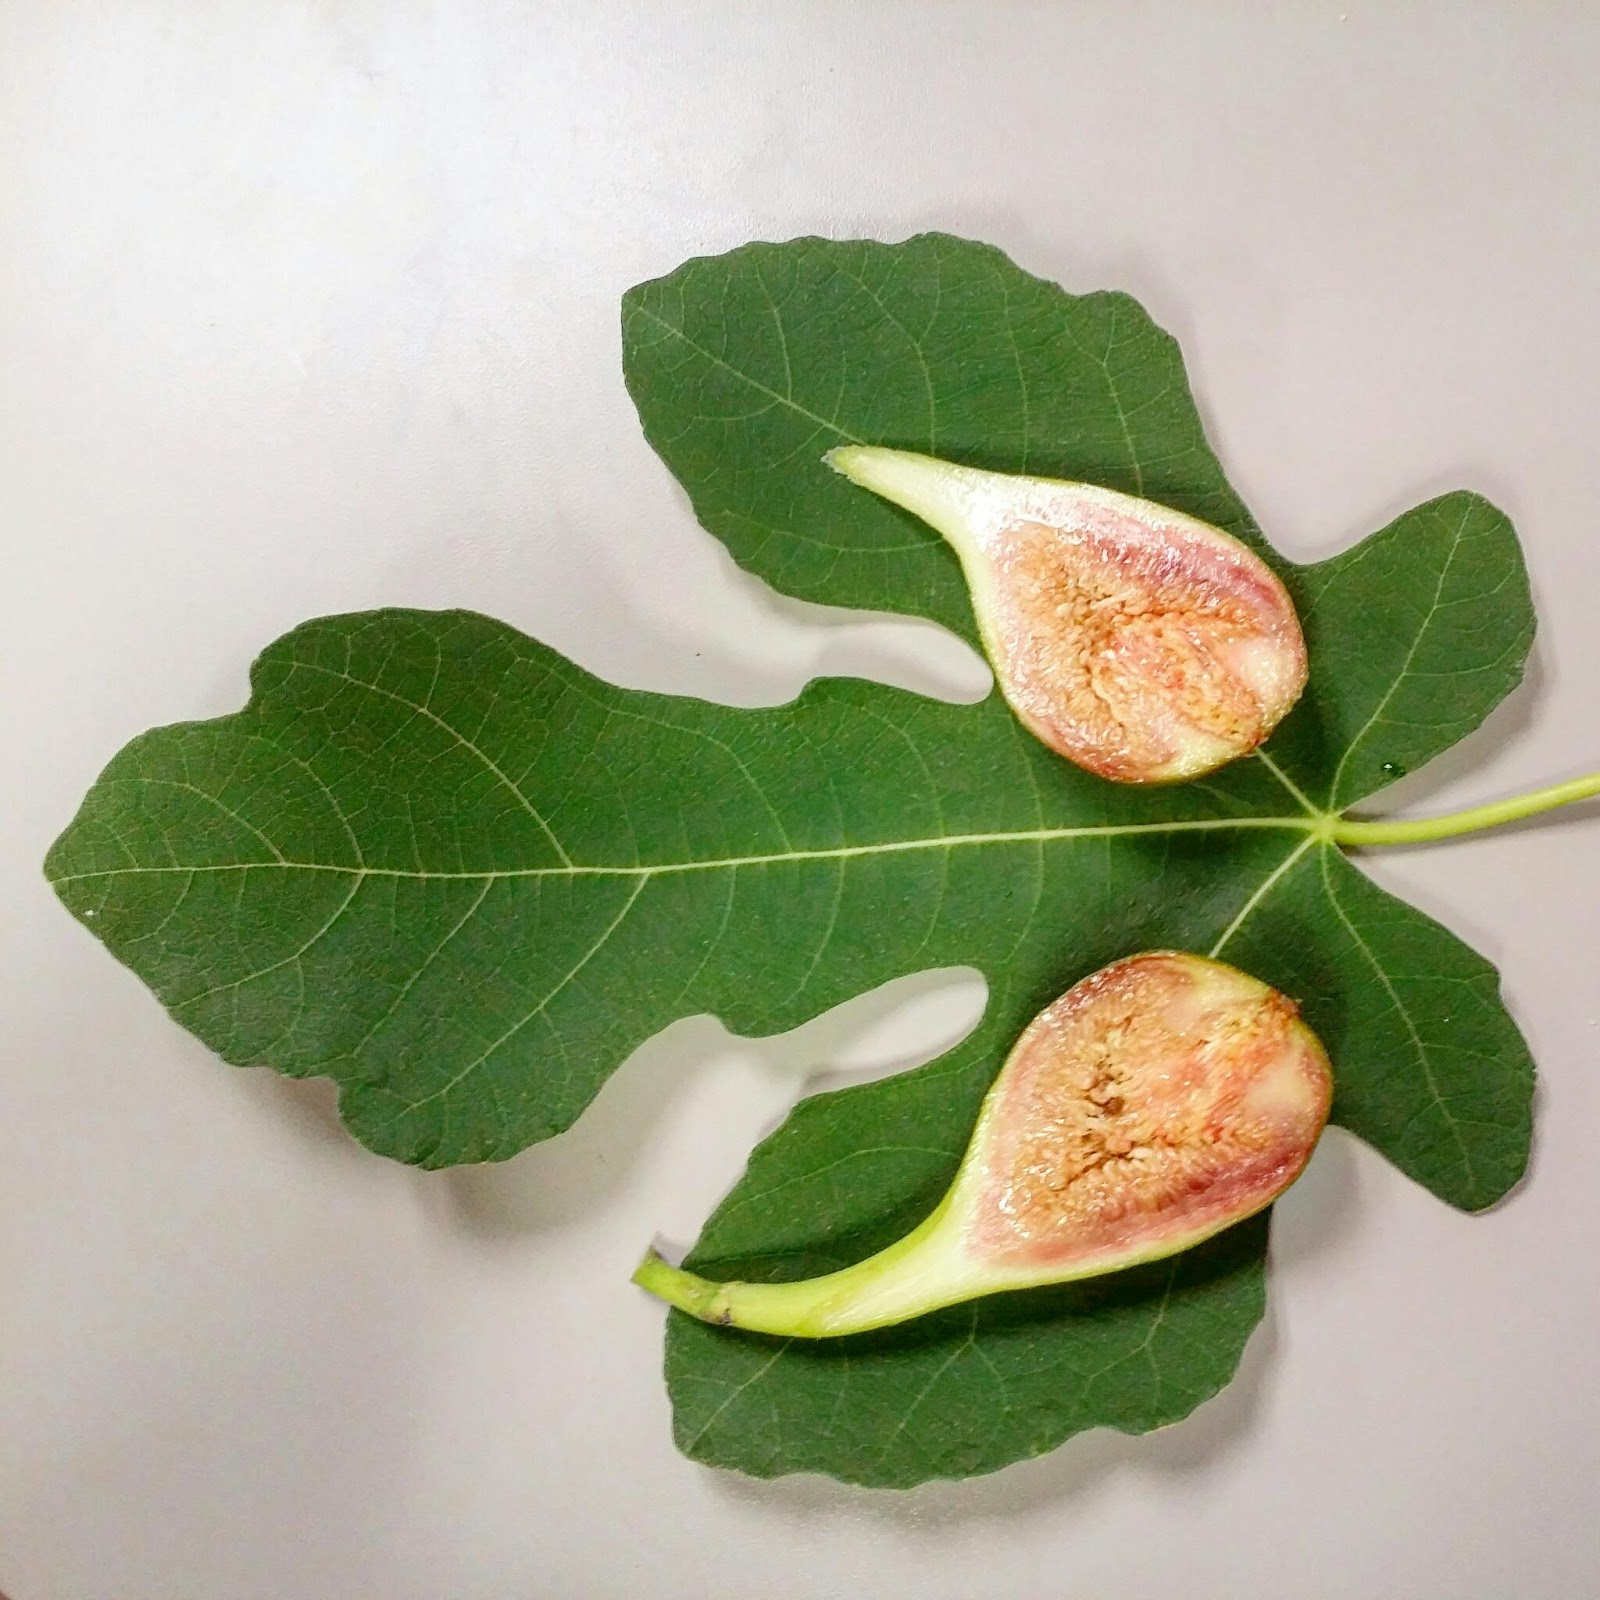 Seattle Garden & Fruit Adventures: 7/31/15 More Ripe Figs